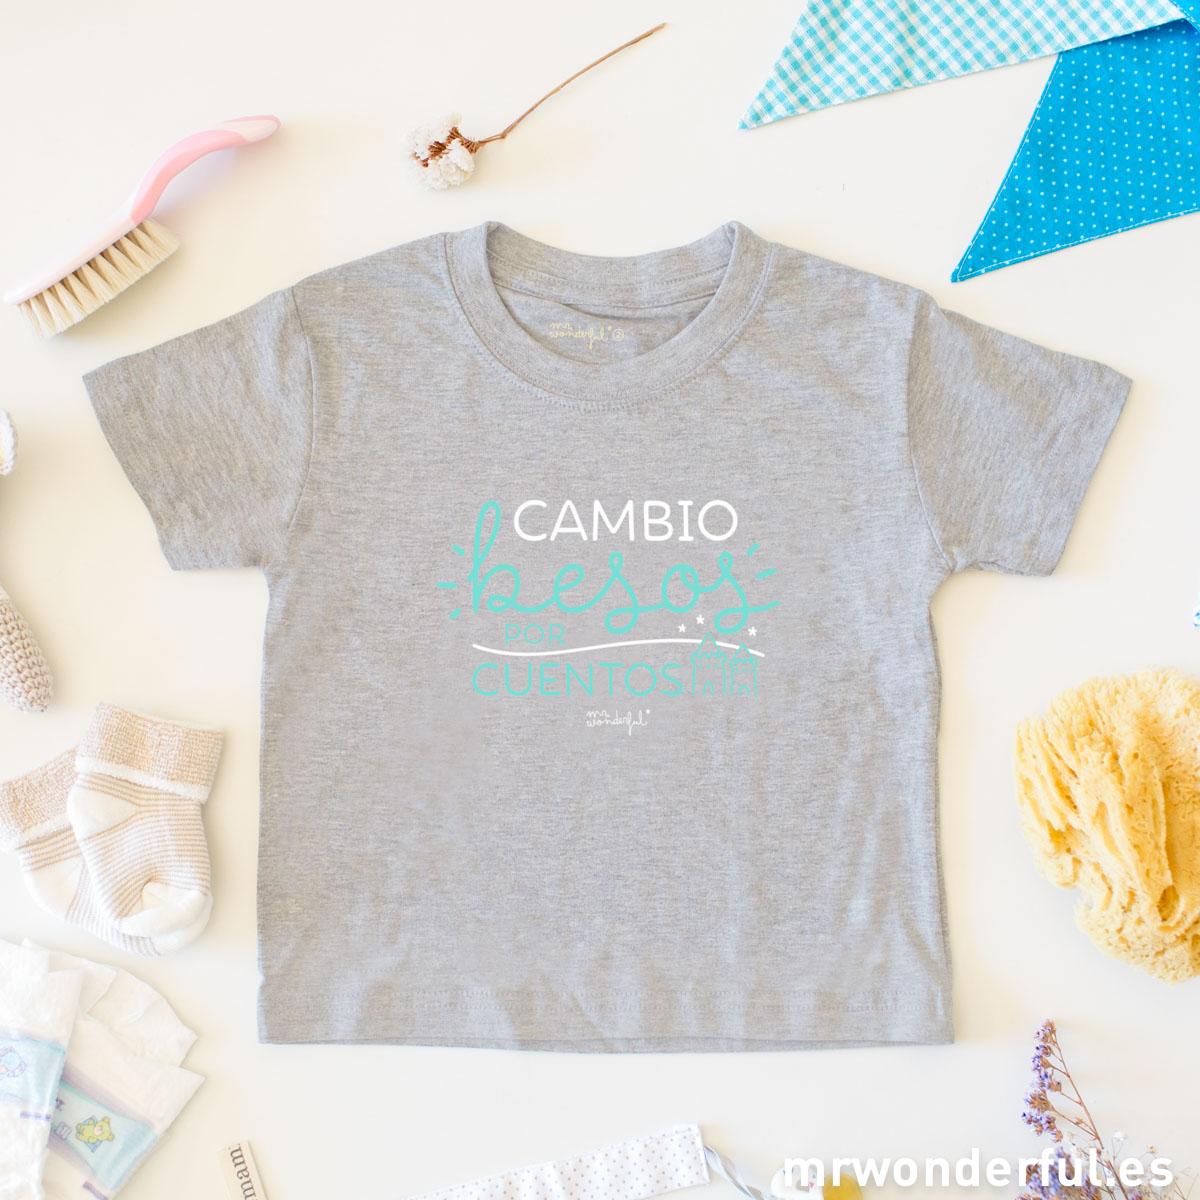 mrwonderful_8436547191093_CAMIS_010_Camiseta-nino-Cambio-besos-por-cuentos-10-Editar